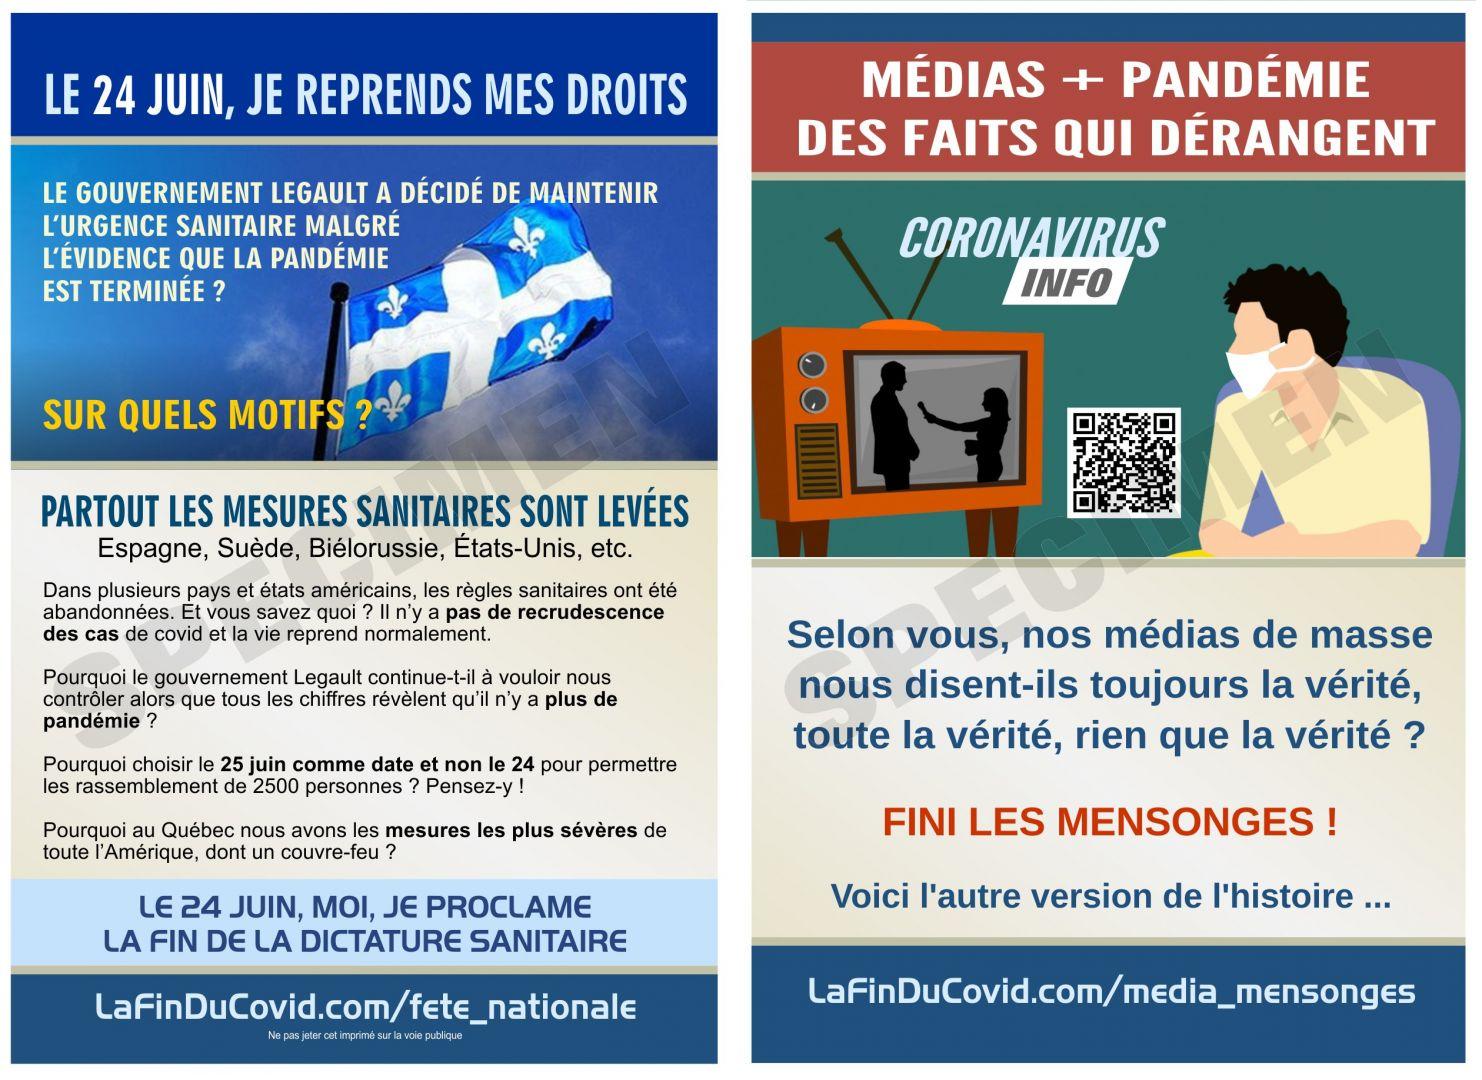 Cartes Postales (4x6) - (24 juin - Medias manipulateurs)